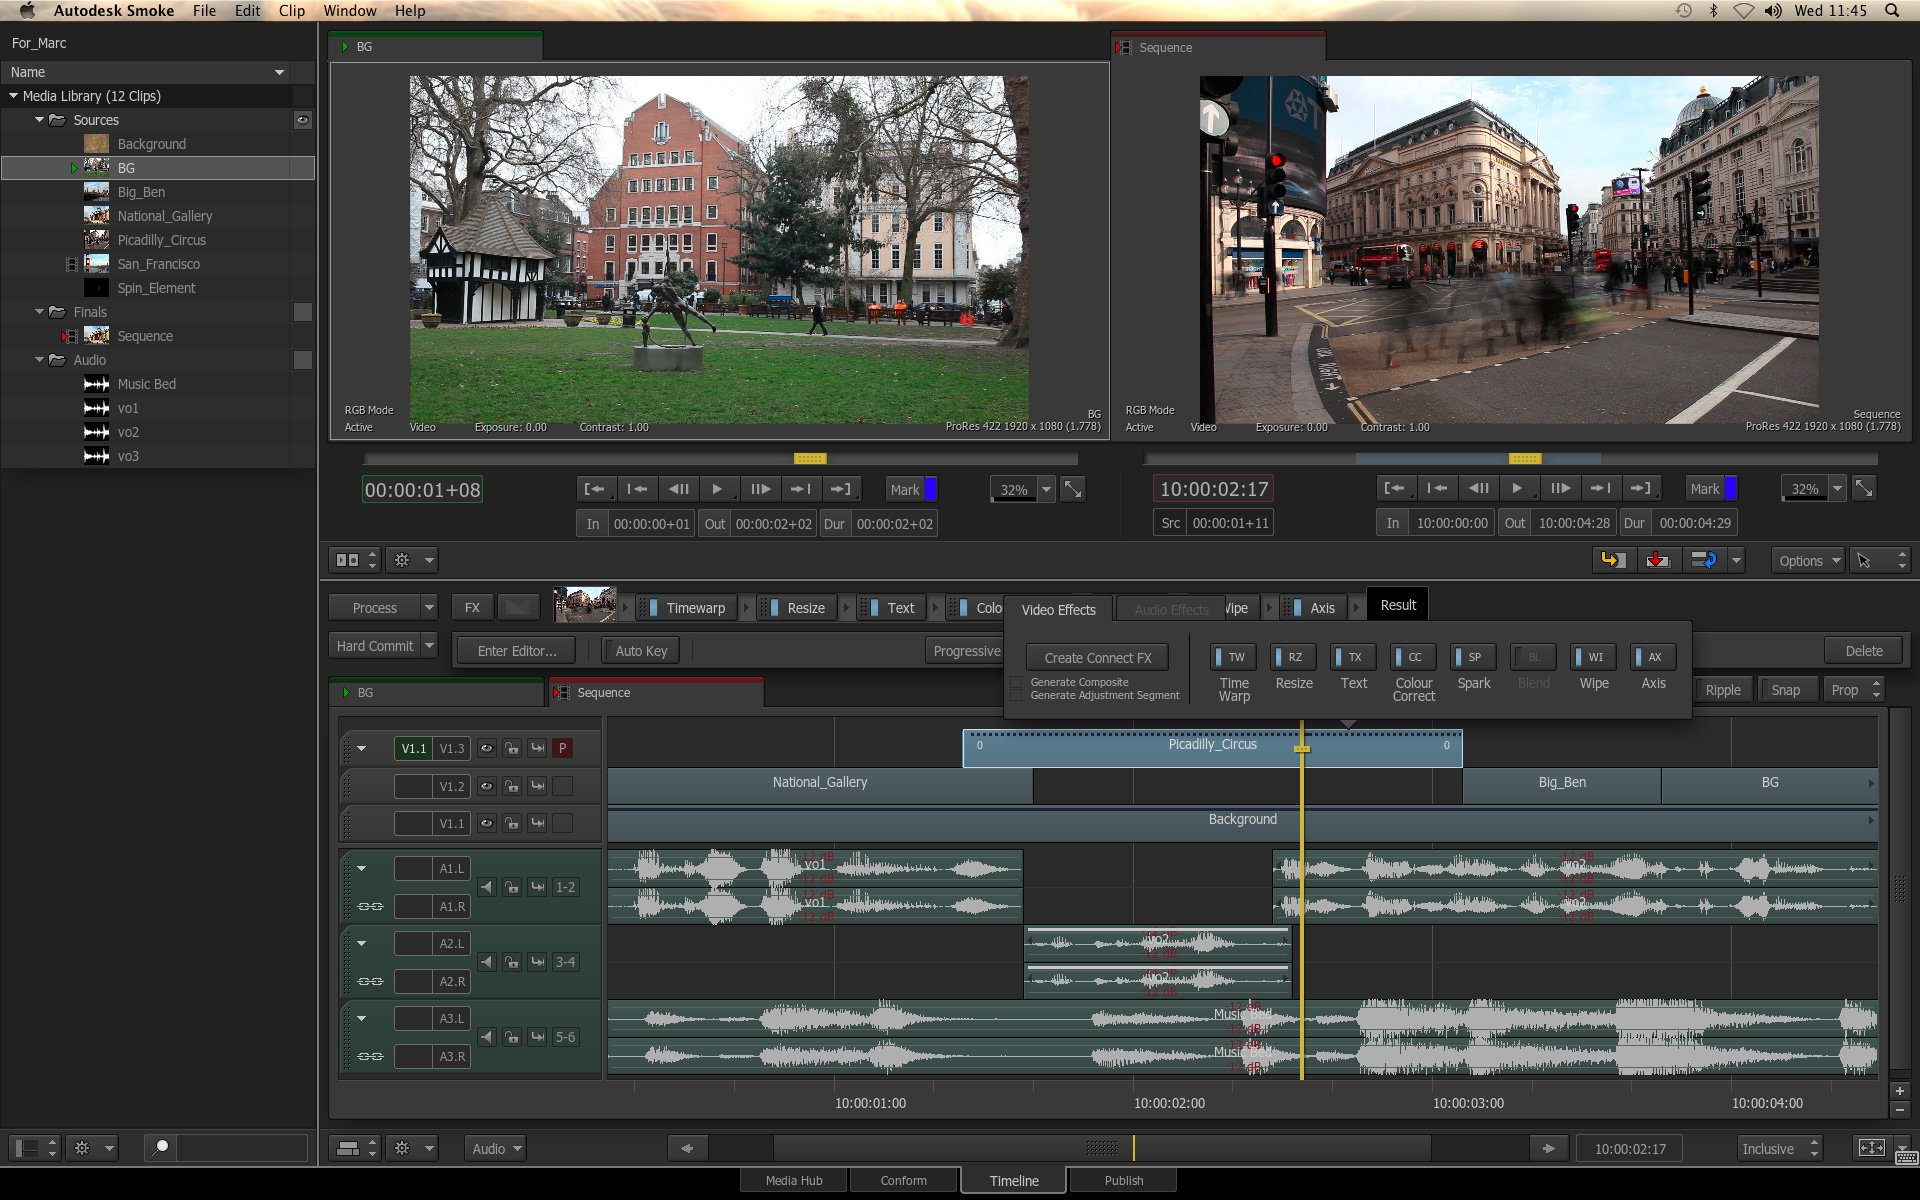 Autodesk Smoke 2013: Autodesk Intros Radically Redesigned Video